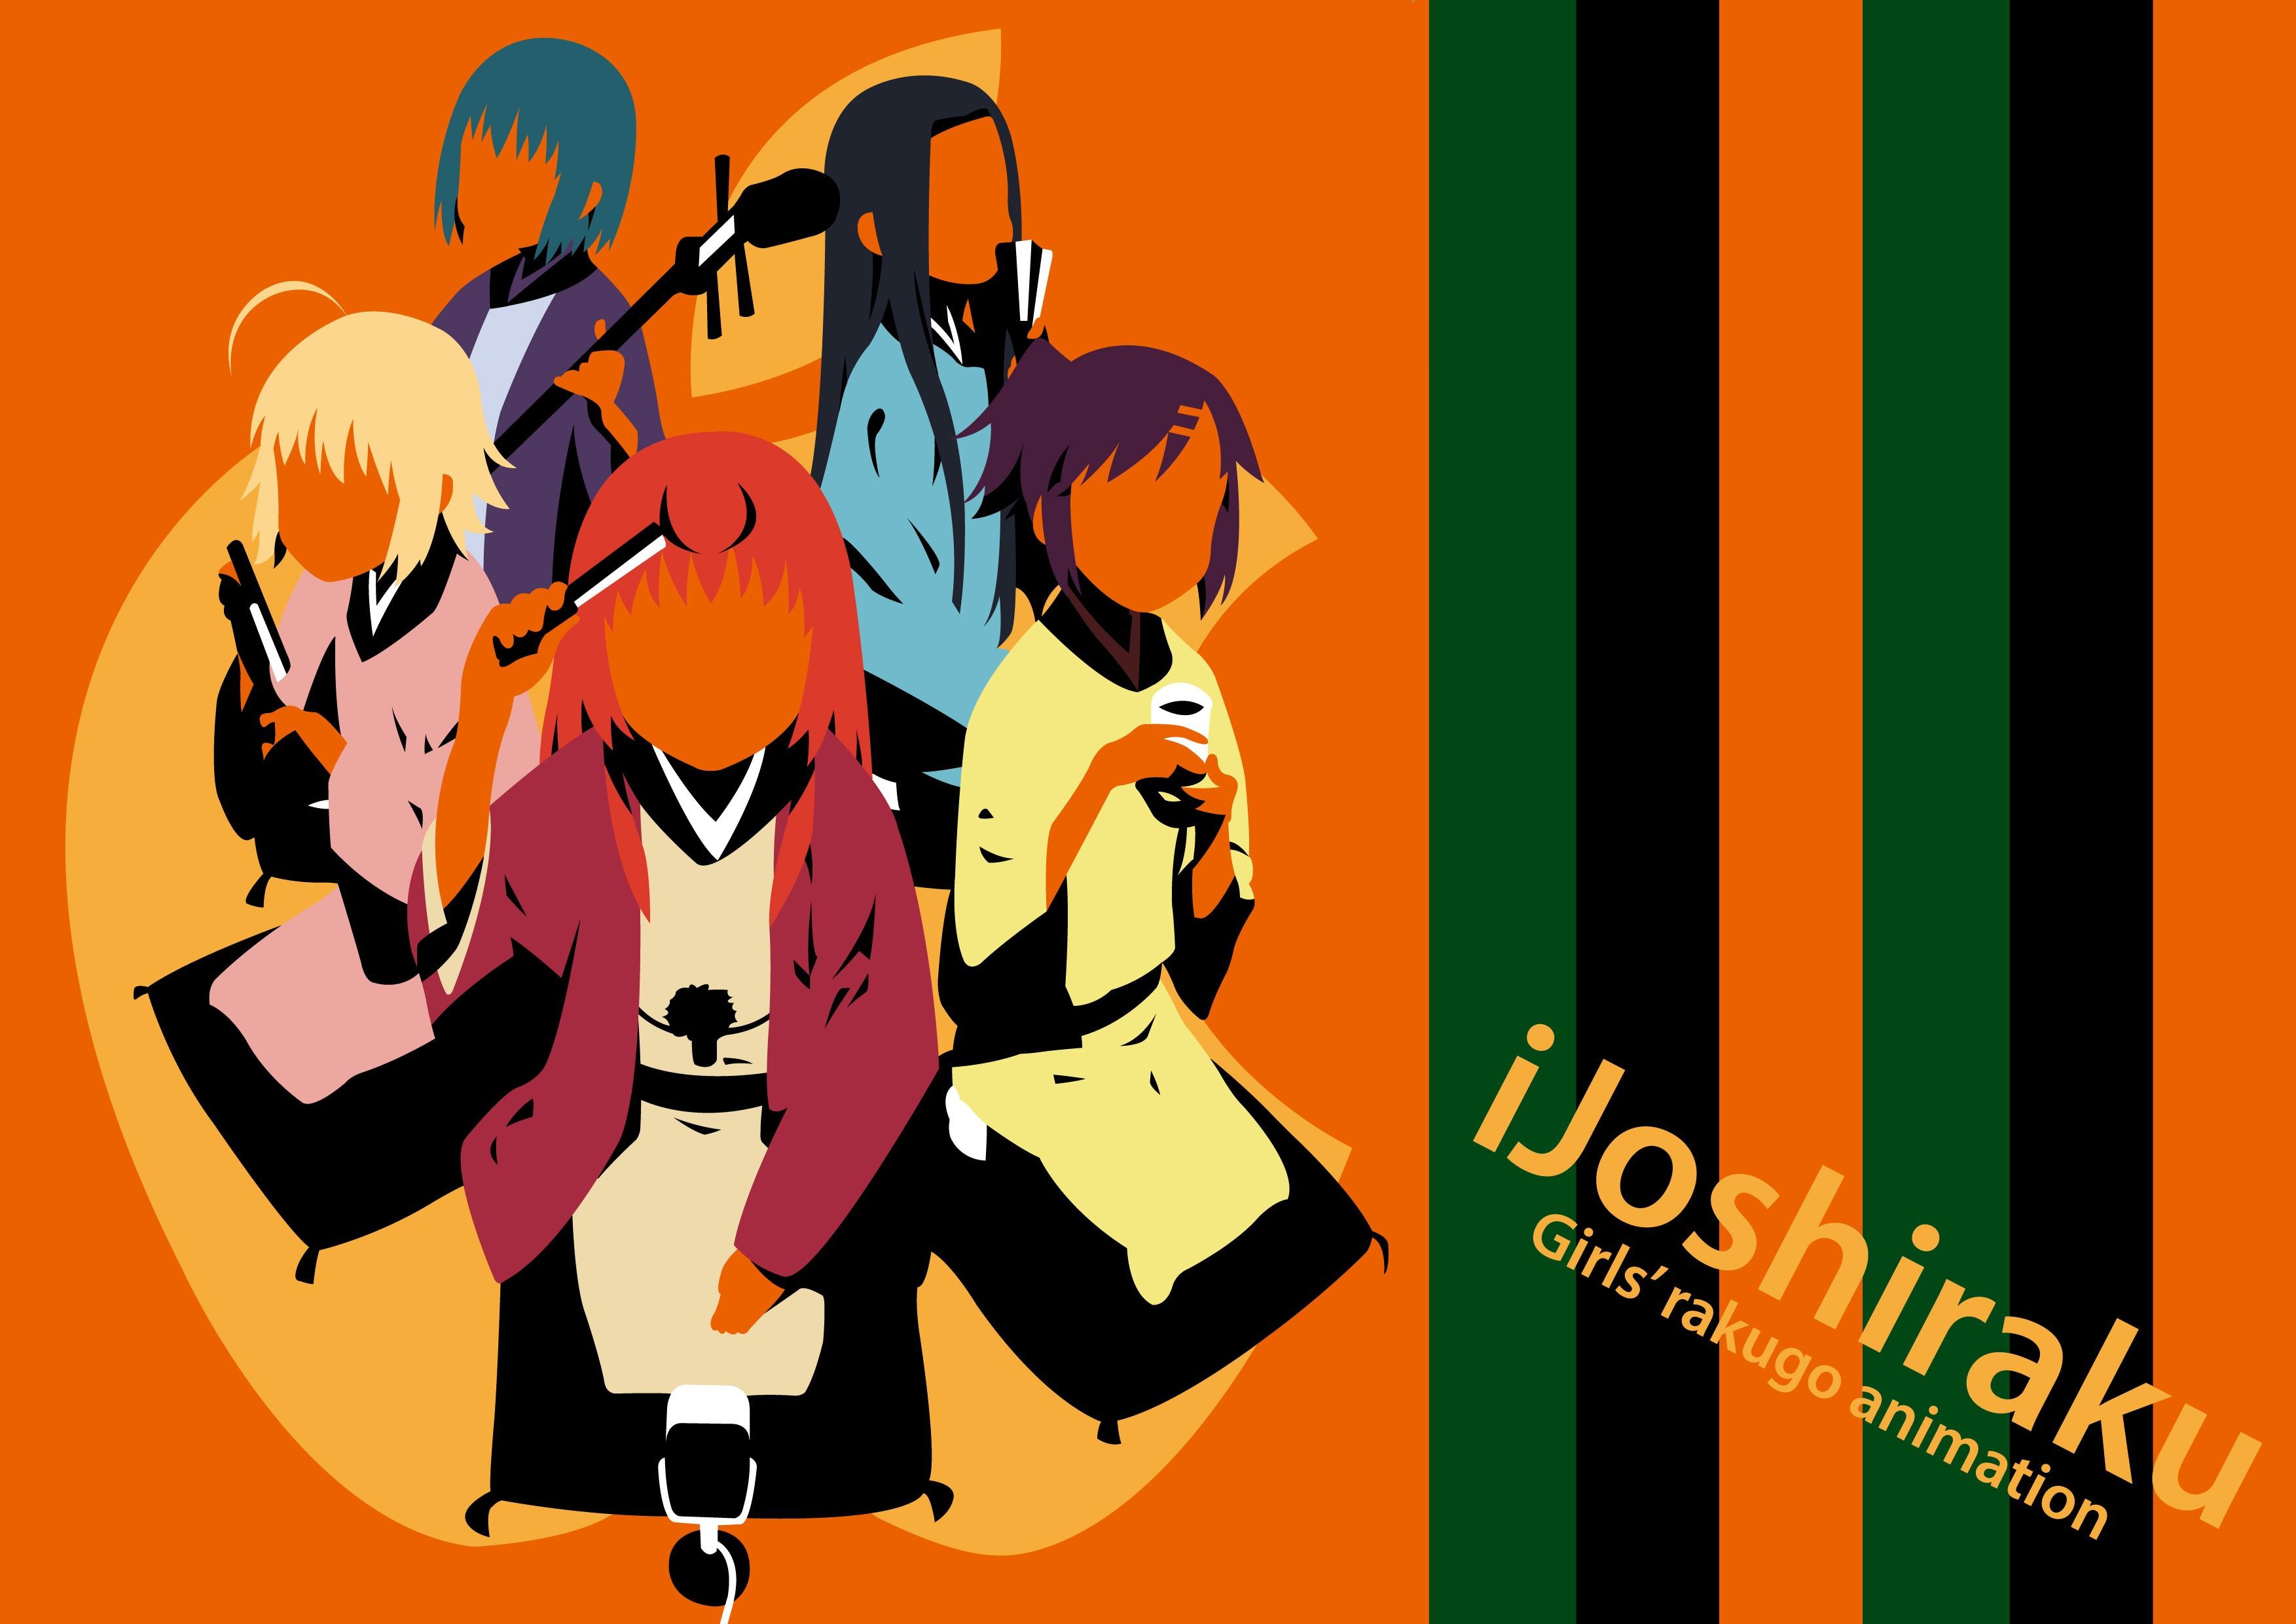 Joshiraku HD Wallpaper Background Image 3507x2480 ID339152 3507x2480